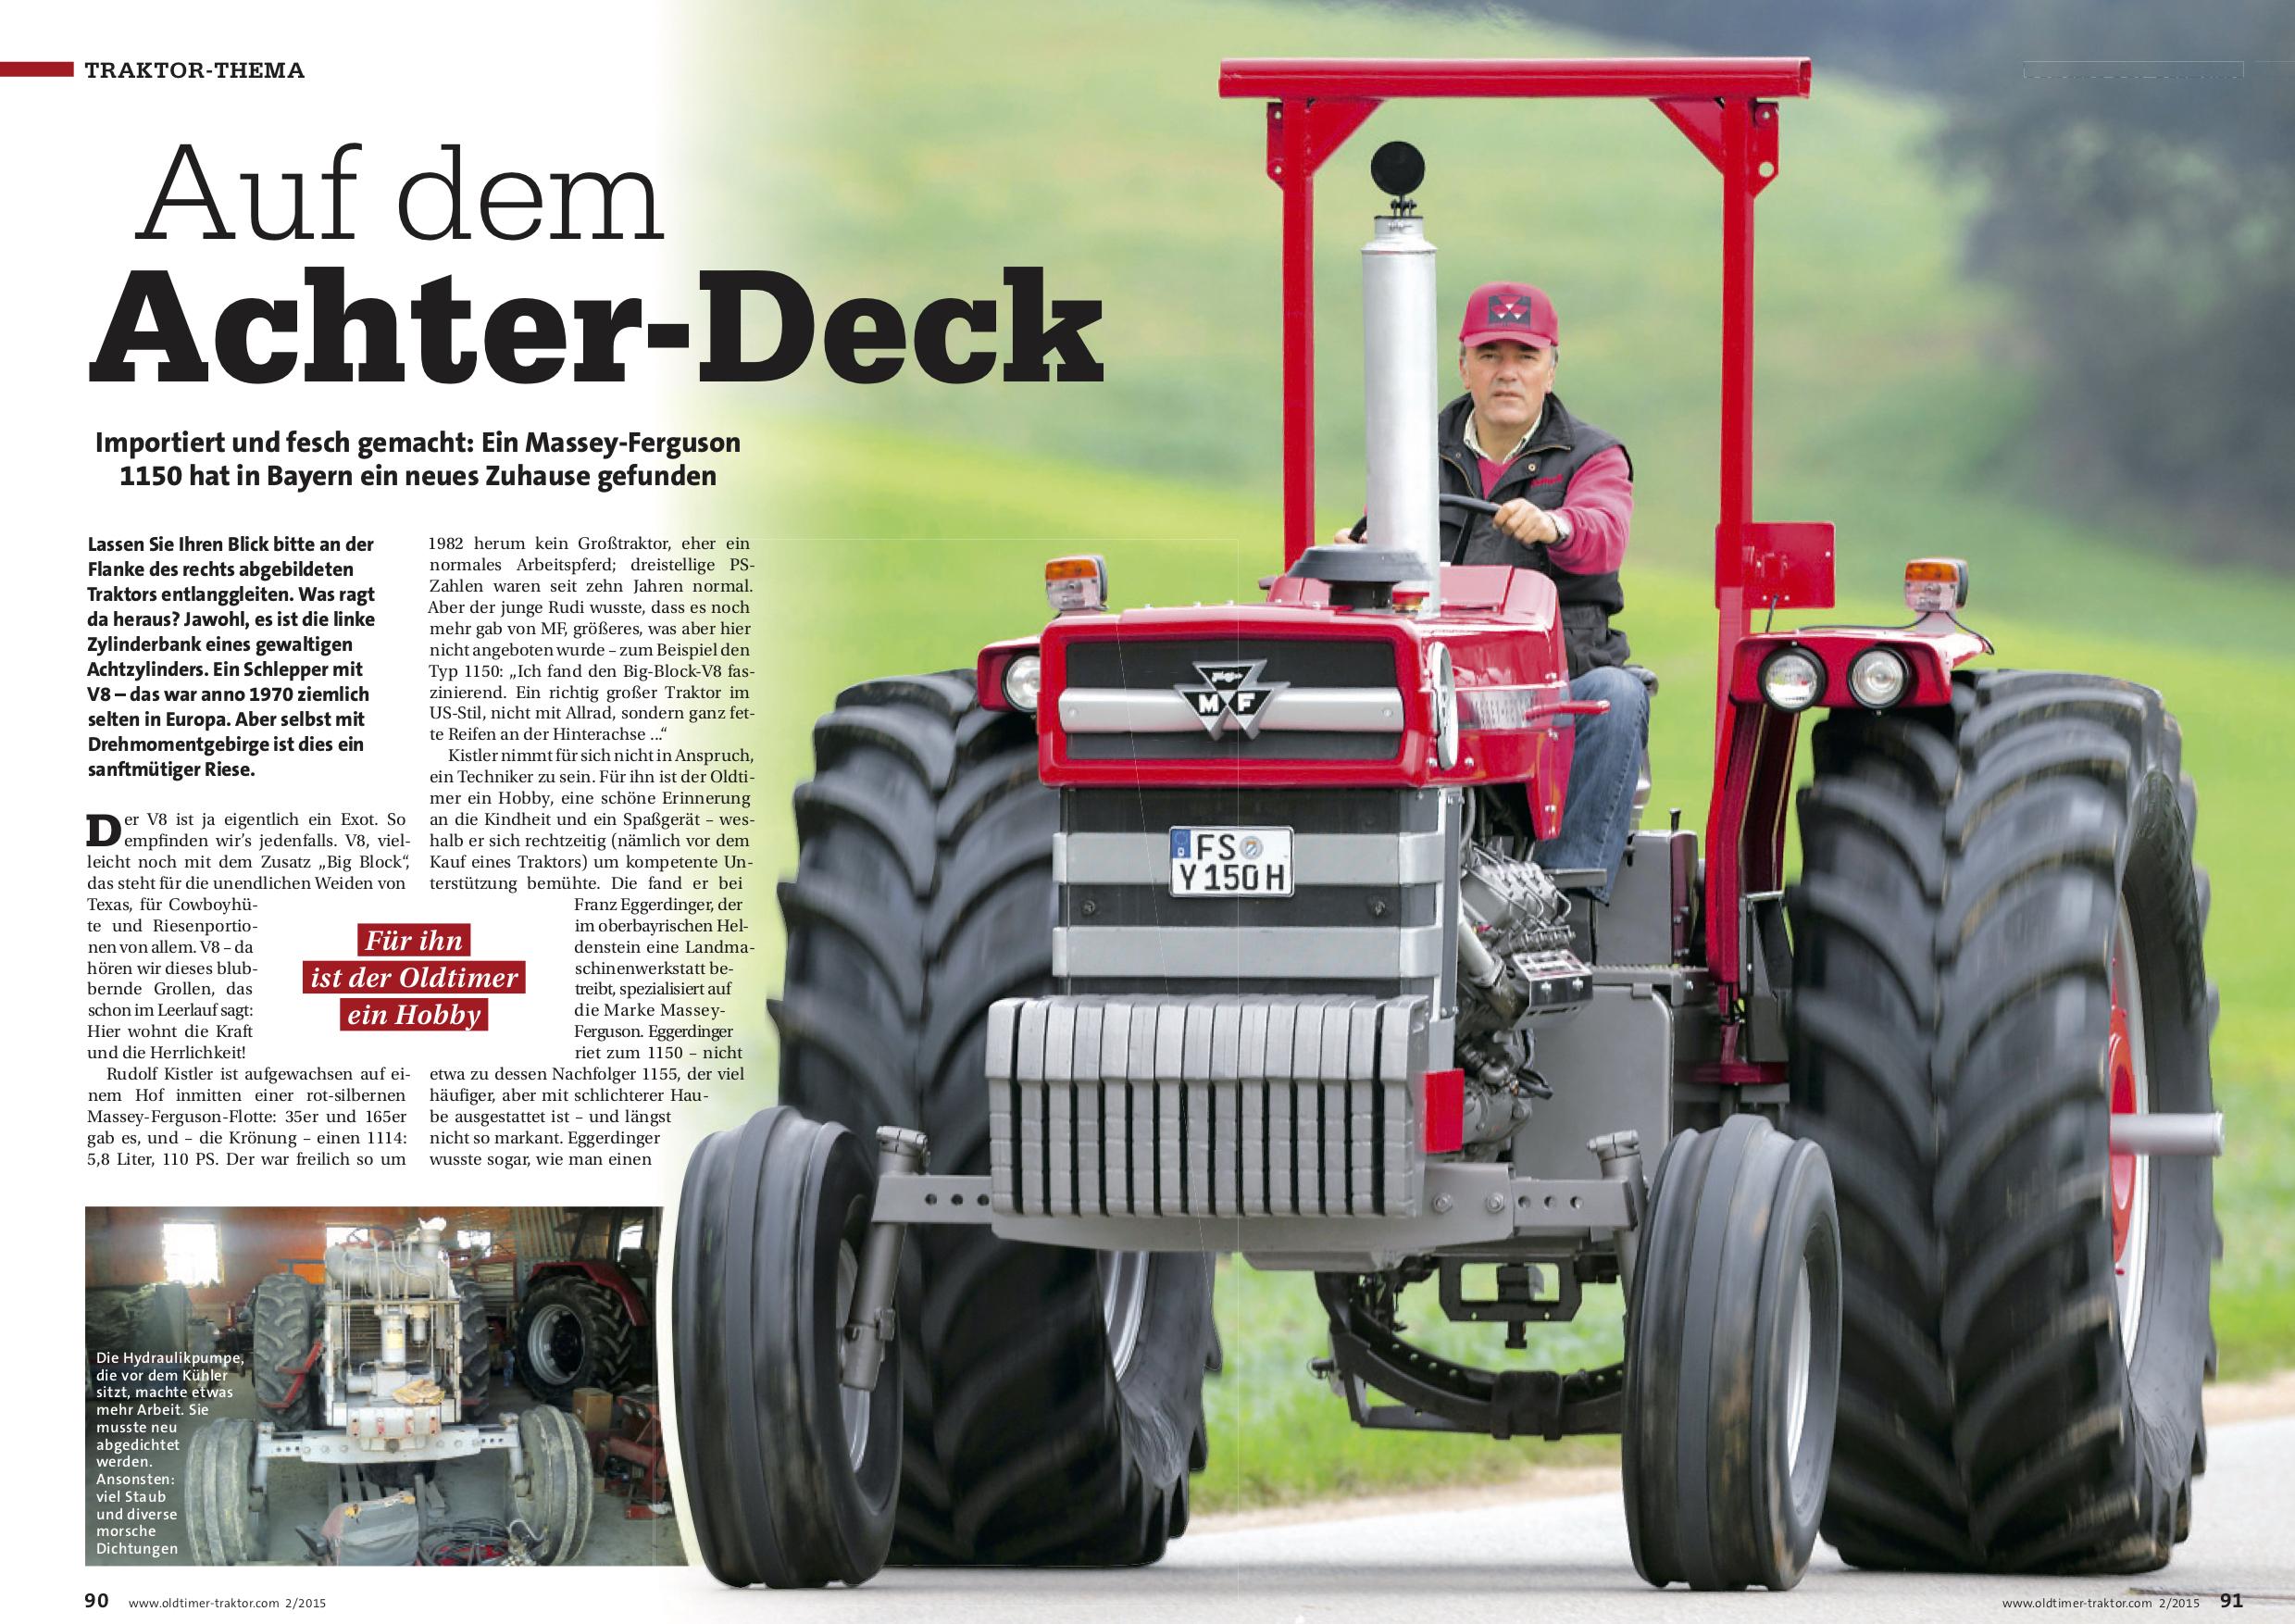 OTT_AG_2015_02_OTT_2-20ll15_Traktor-Thema MF 1150.indd-20150115-151553950.jpg